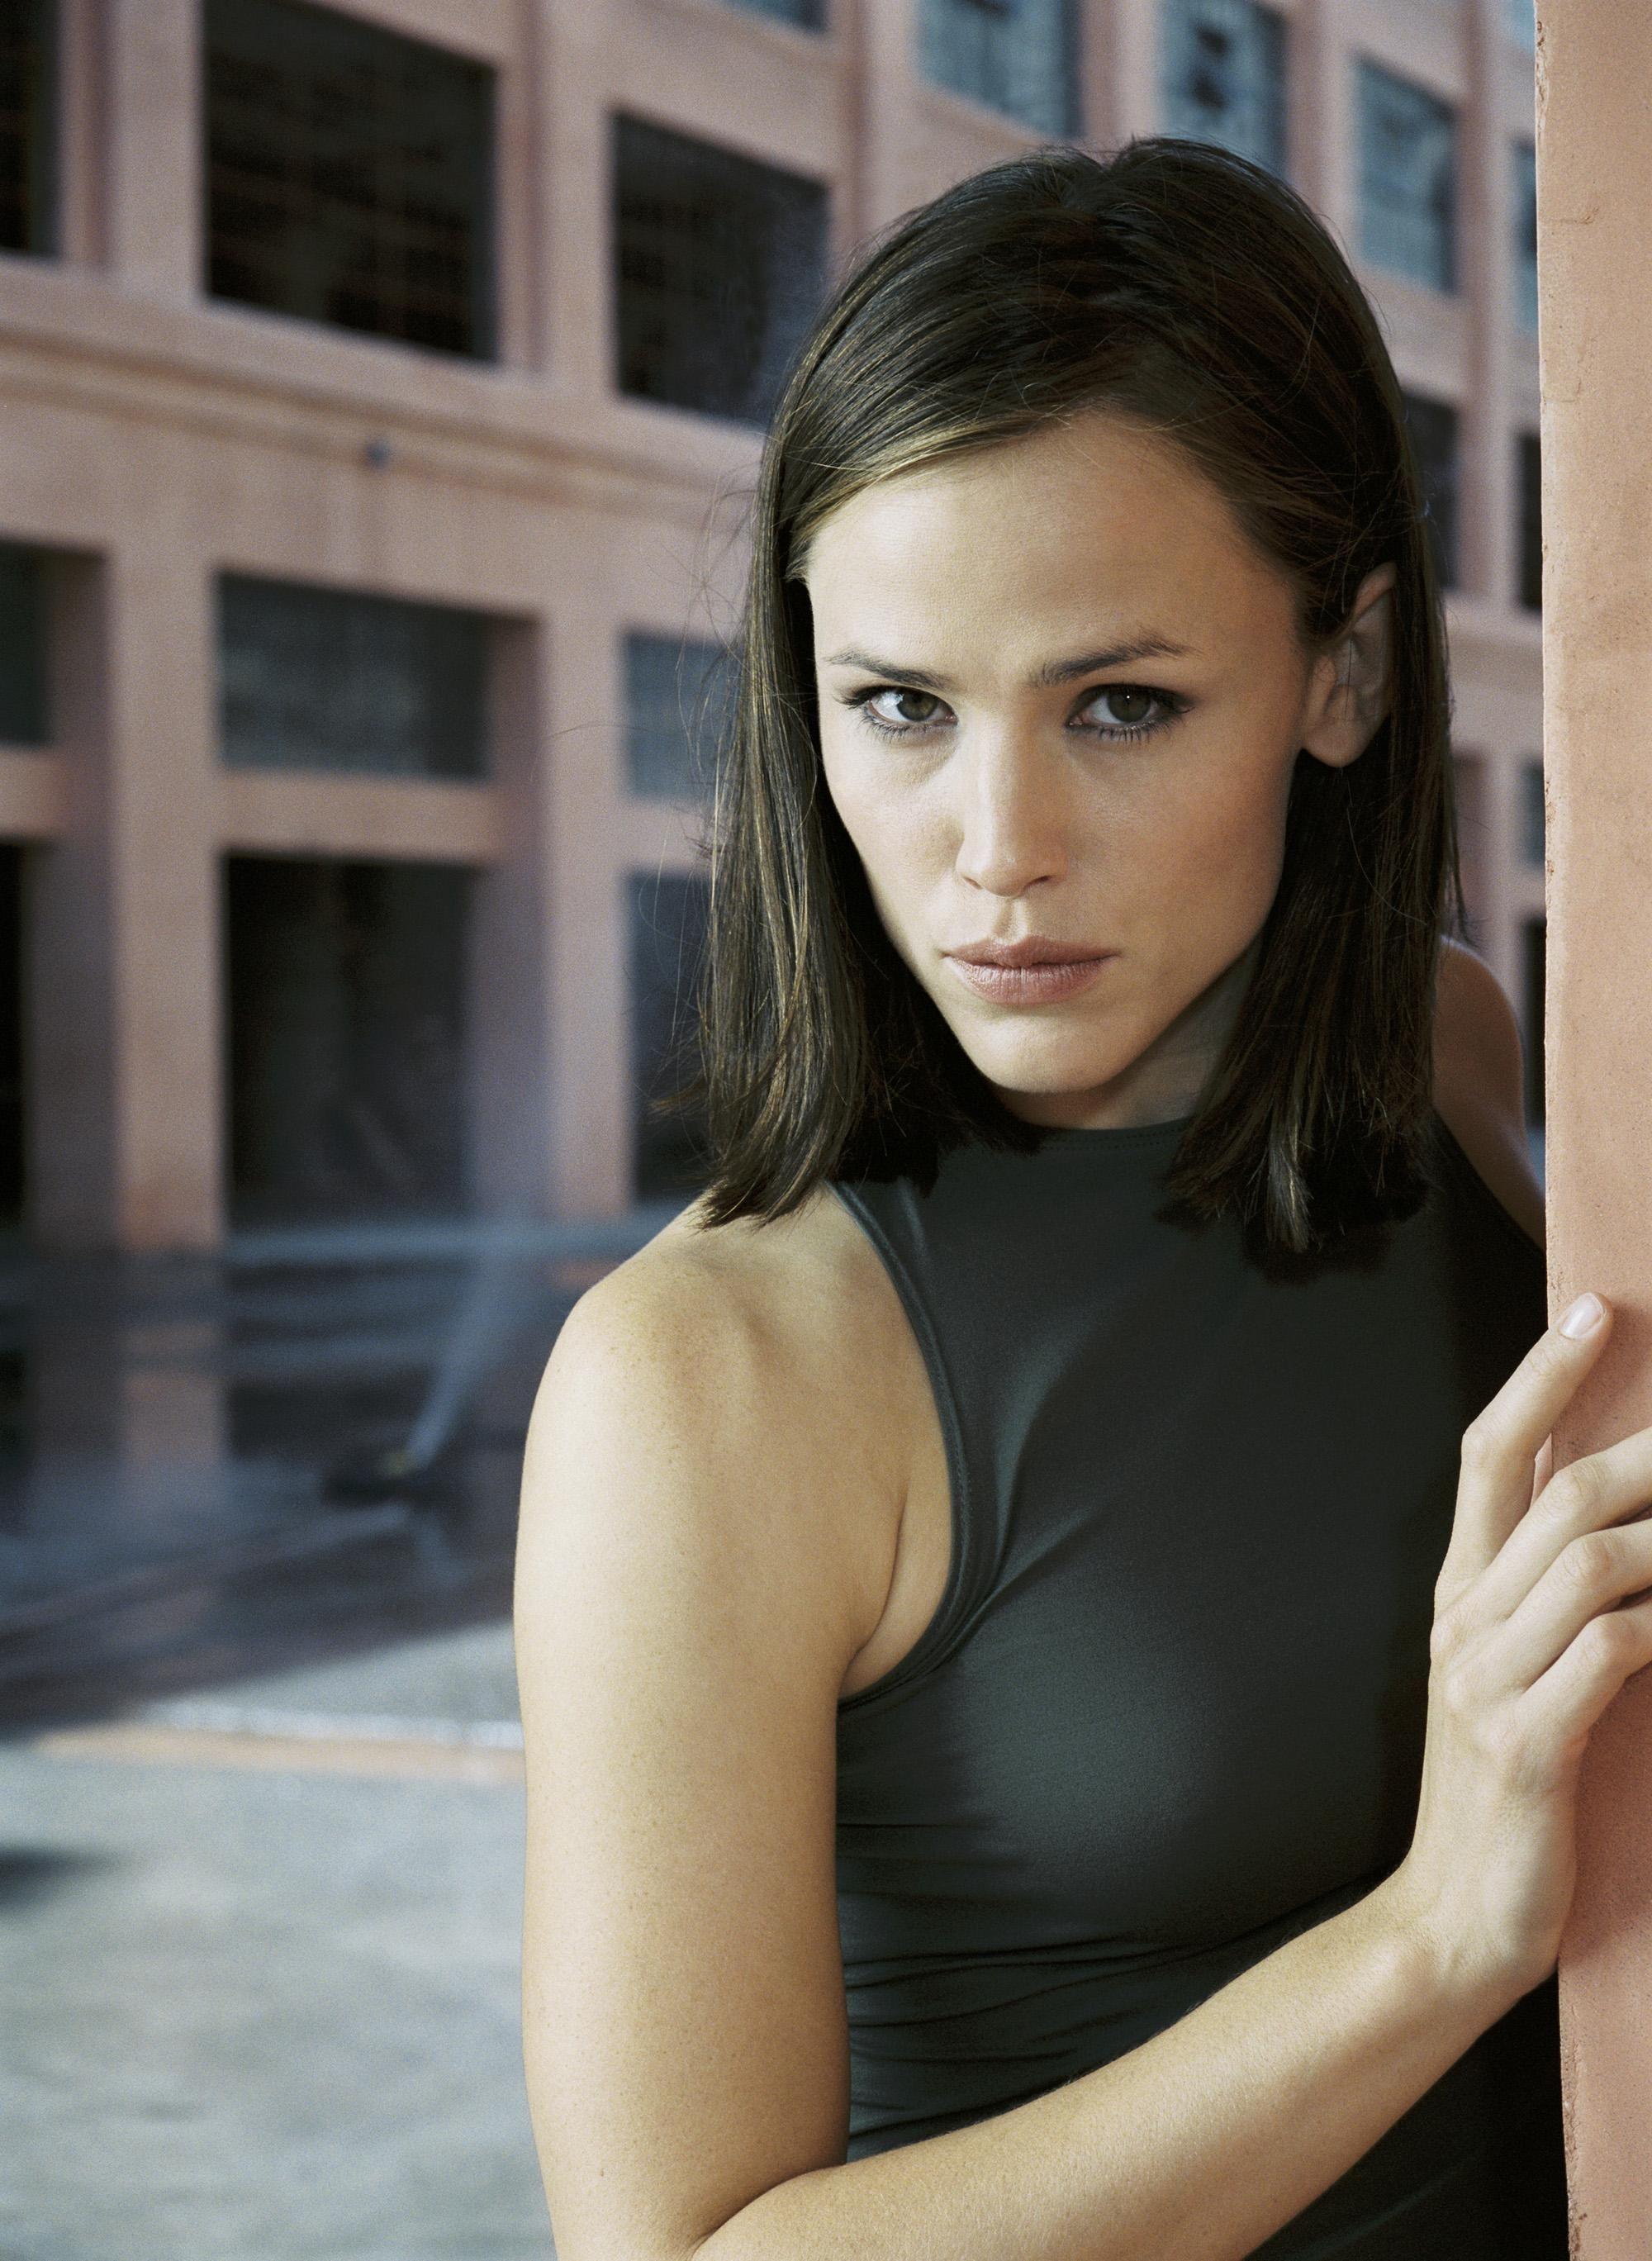 Celebrites Sydney Roper nudes (16 photos), Tits, Cleavage, Instagram, braless 2020